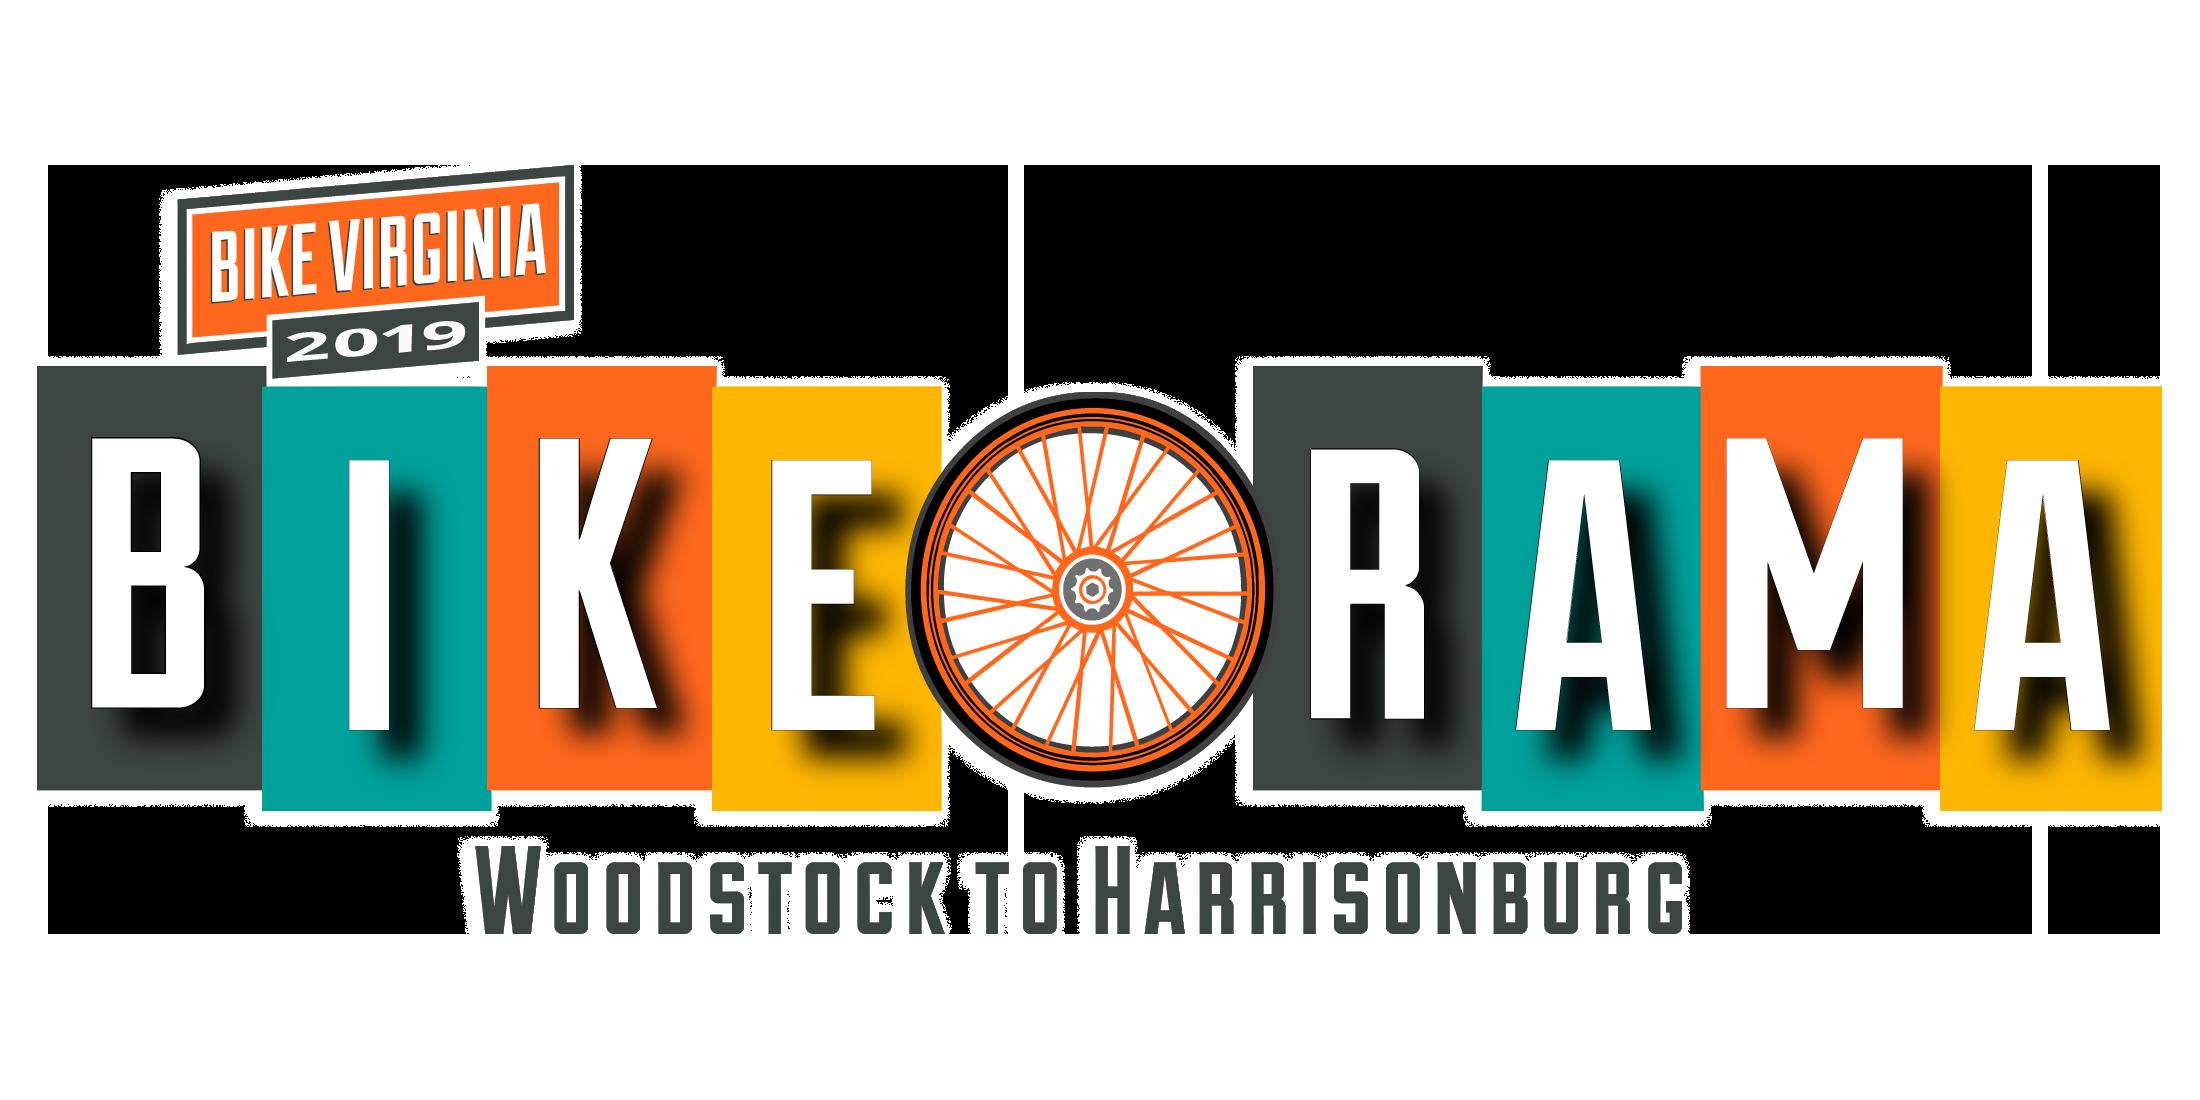 2019 Bike Virginia Tour — Register – Bike Virginia